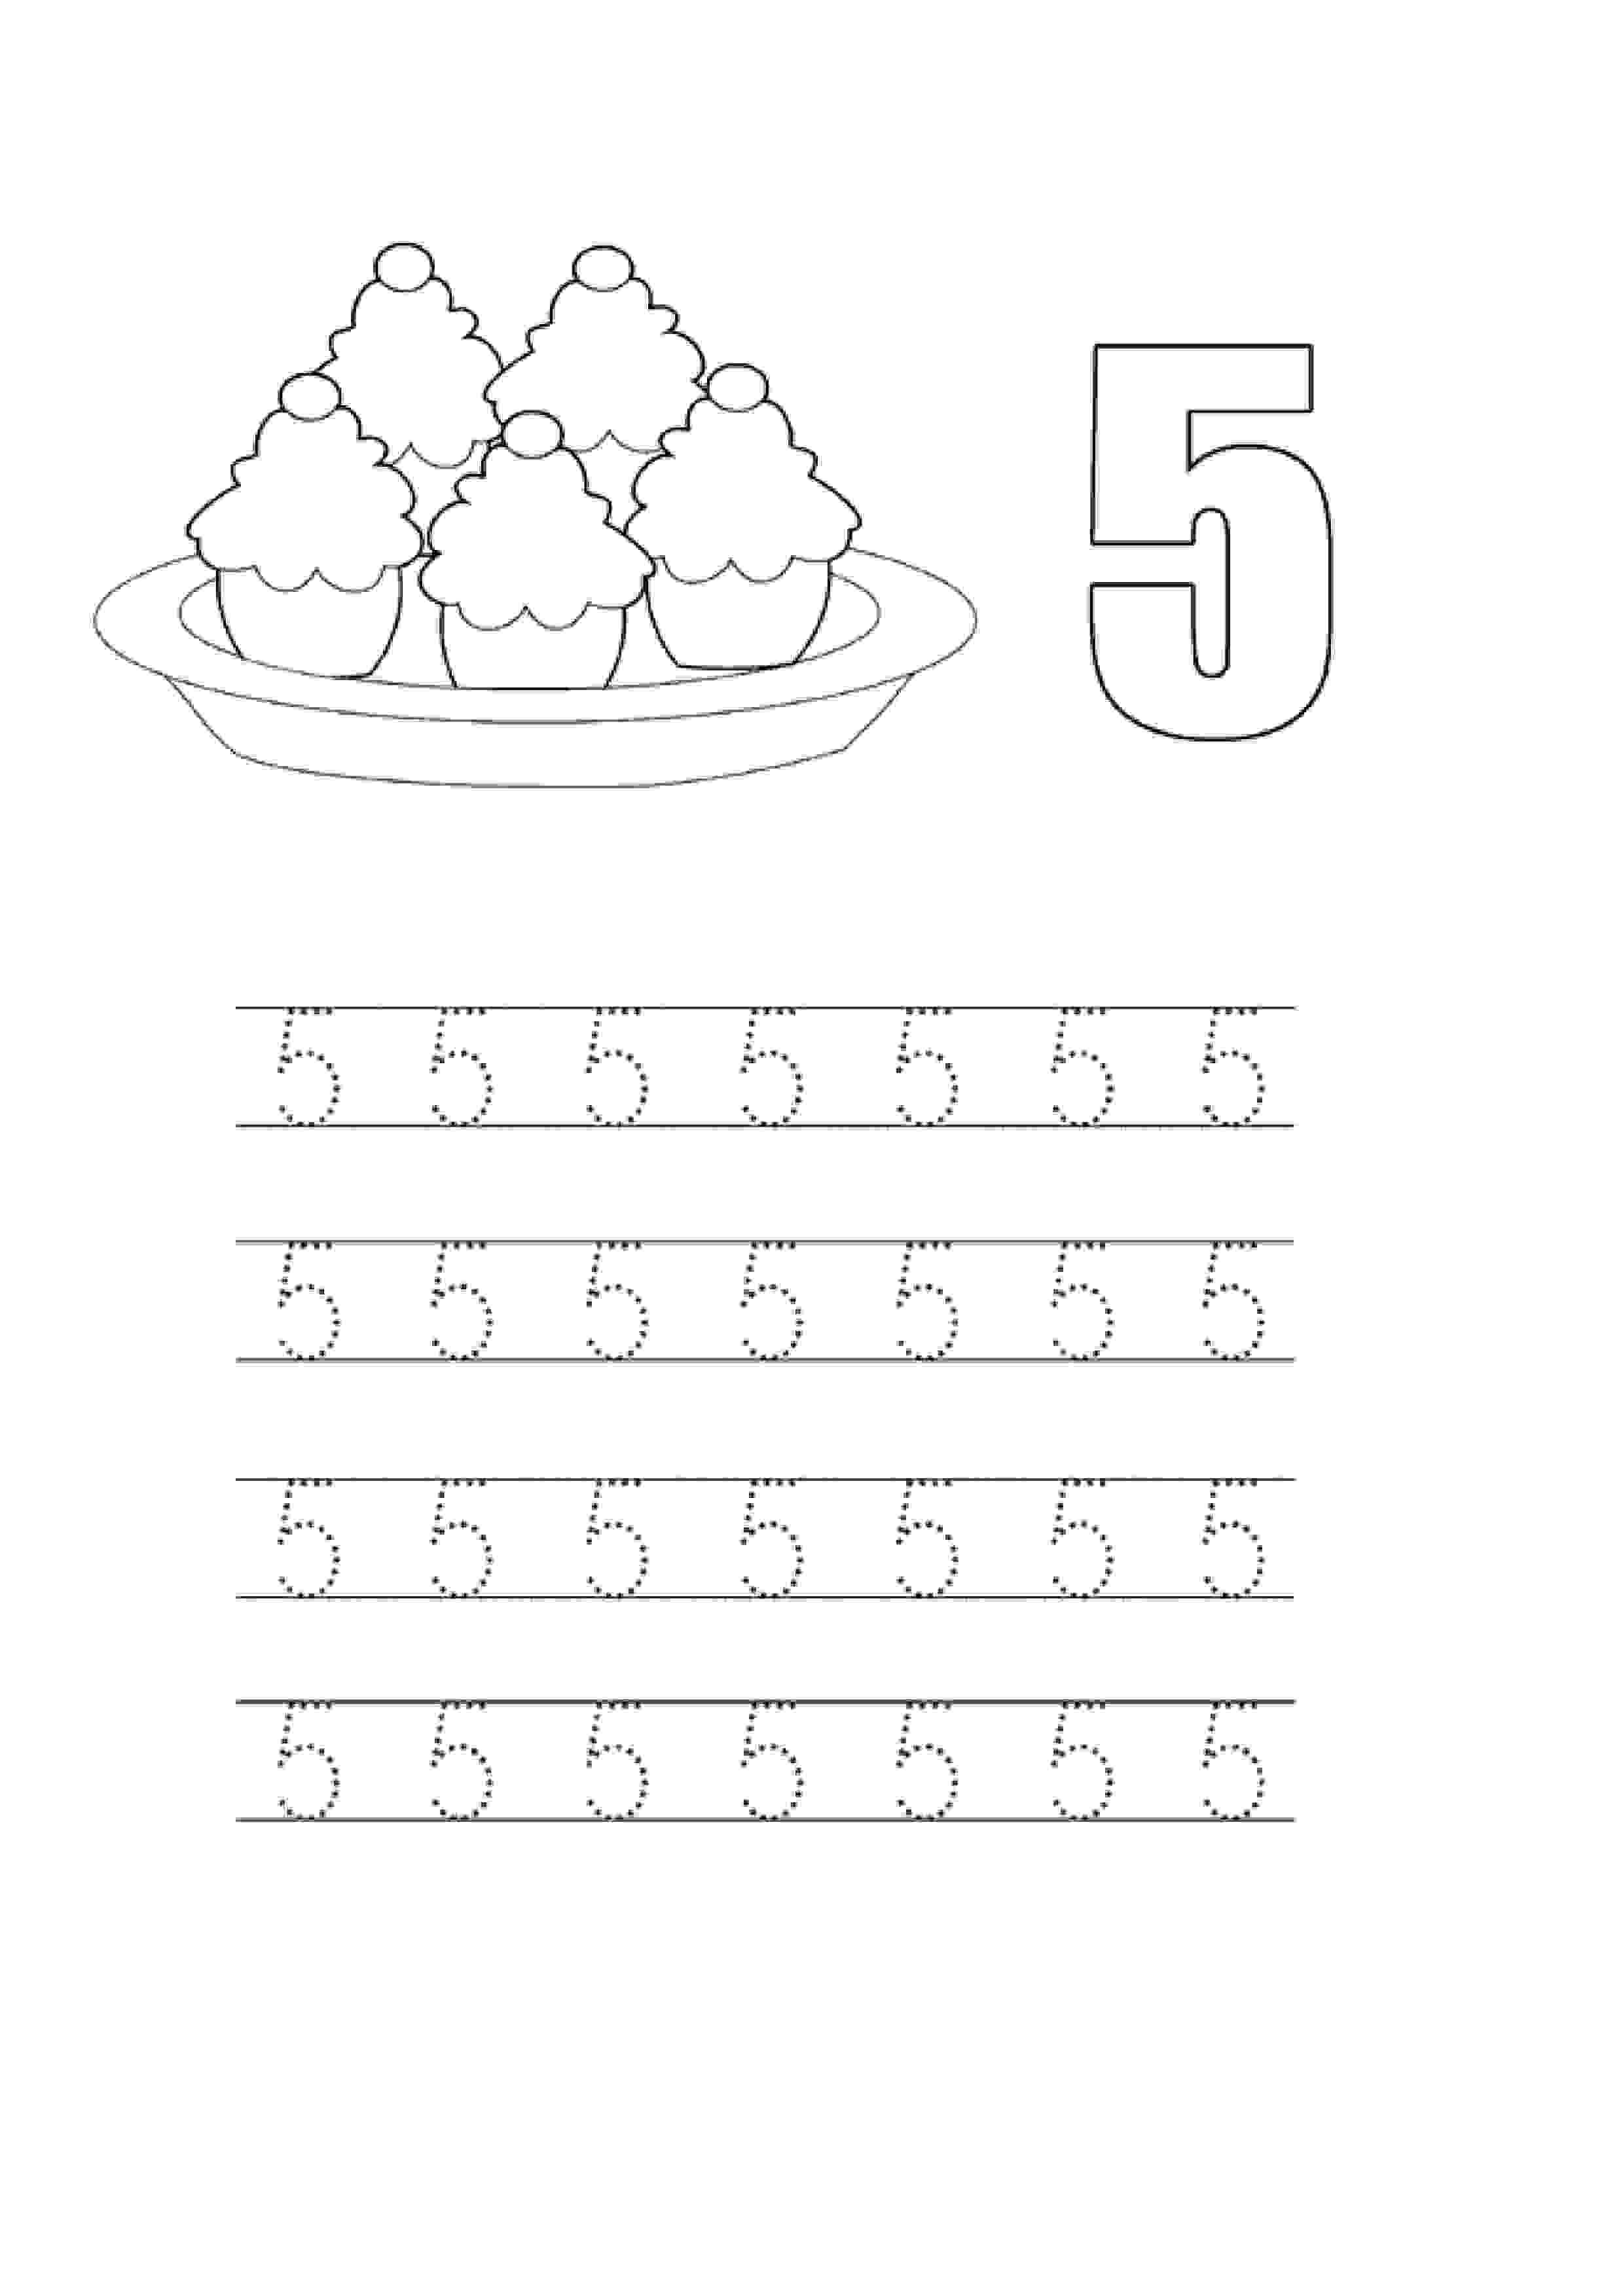 Actividades Para Ninos Preescolar Primaria E Inicial Fichas Para Imprimir Con Ejercicios De